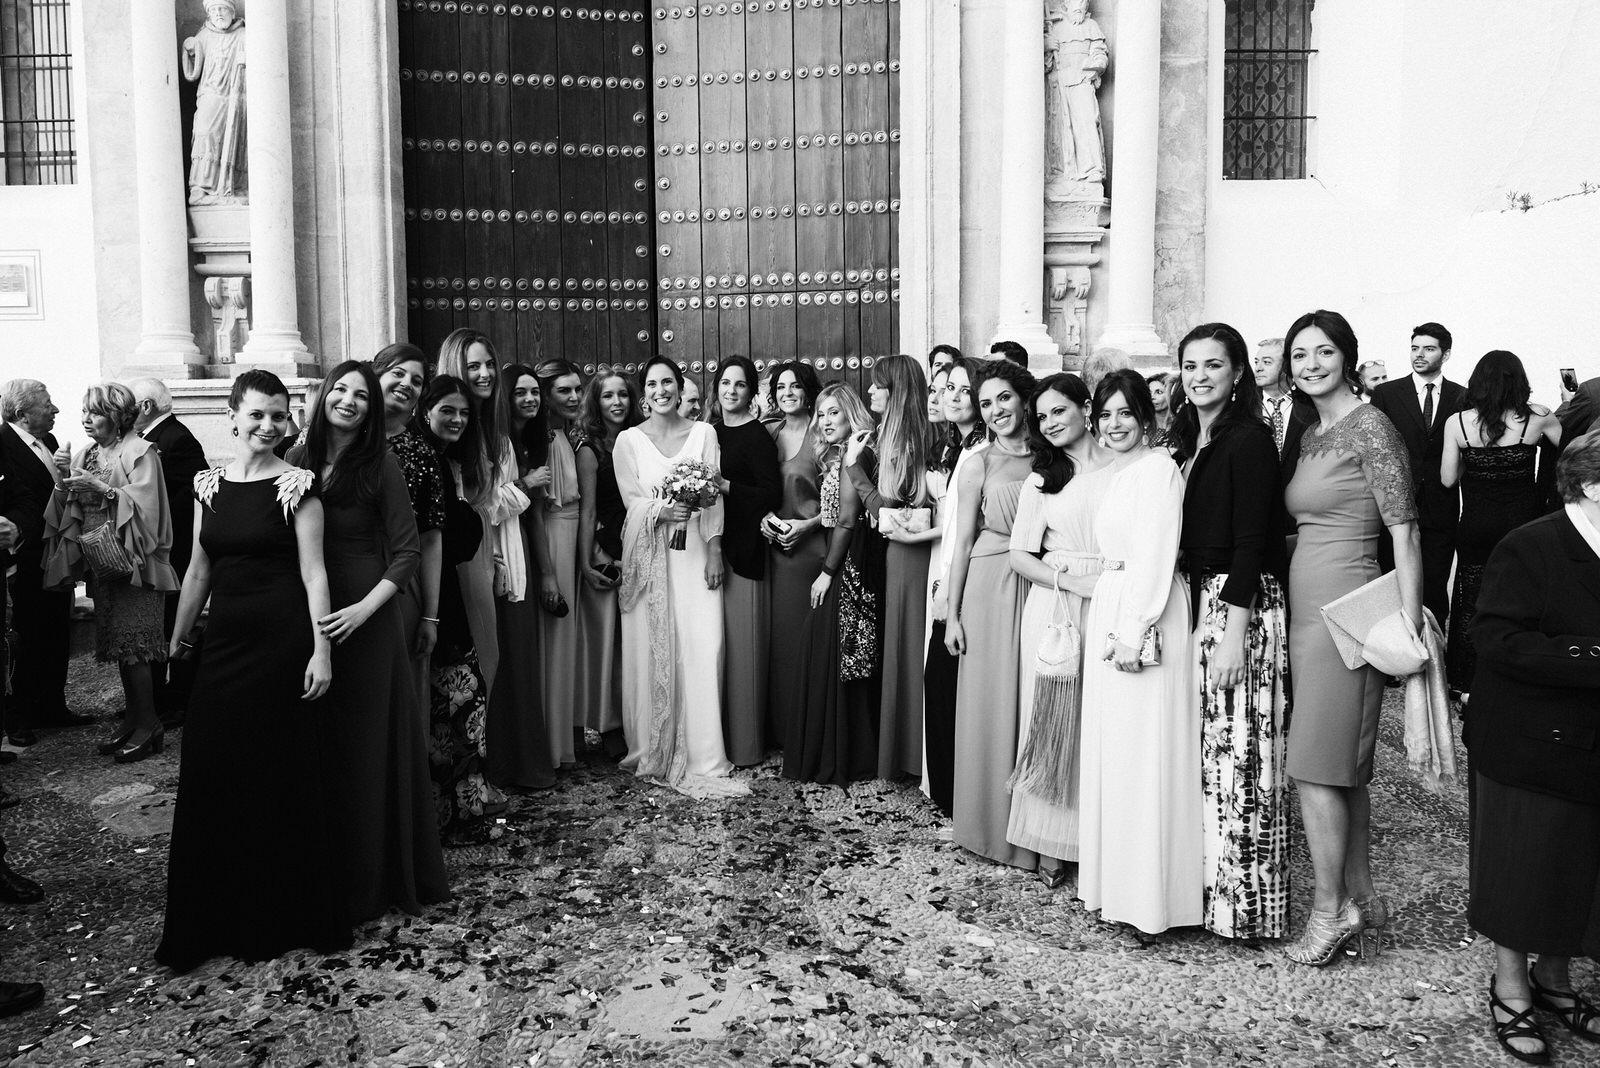 fotografo de bodas sevilla - fotografo boda - fotografía sevilla - Andrés AmarilloAAA_3240-2- fine.JPG